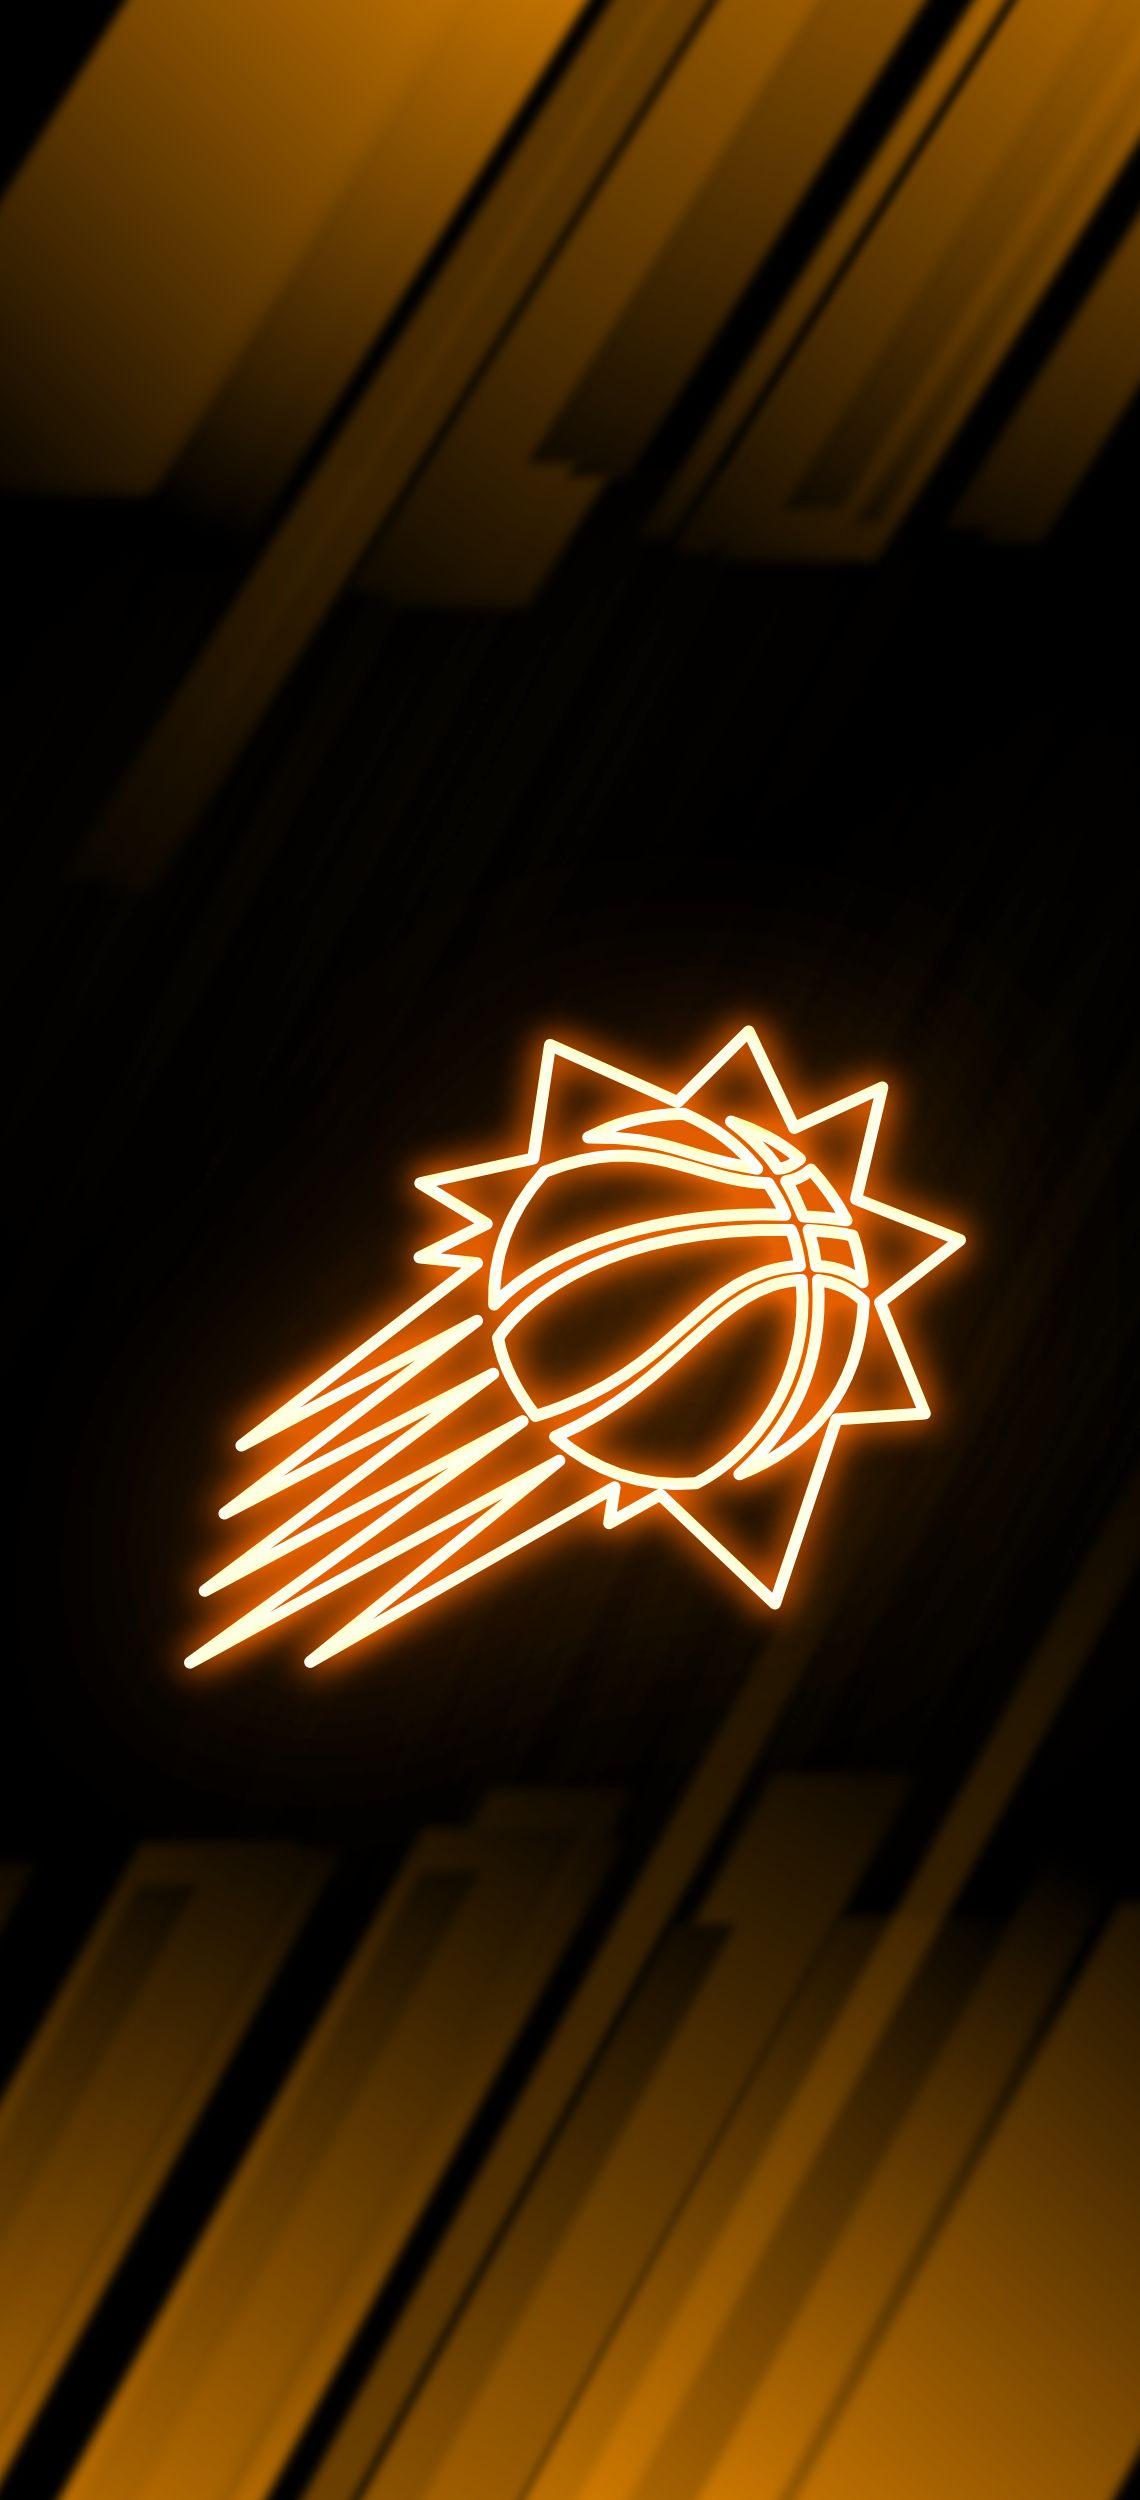 Phoenix Suns Neon Wallpaper Phoenix Suns Nba Wallpapers Neon Wallpaper